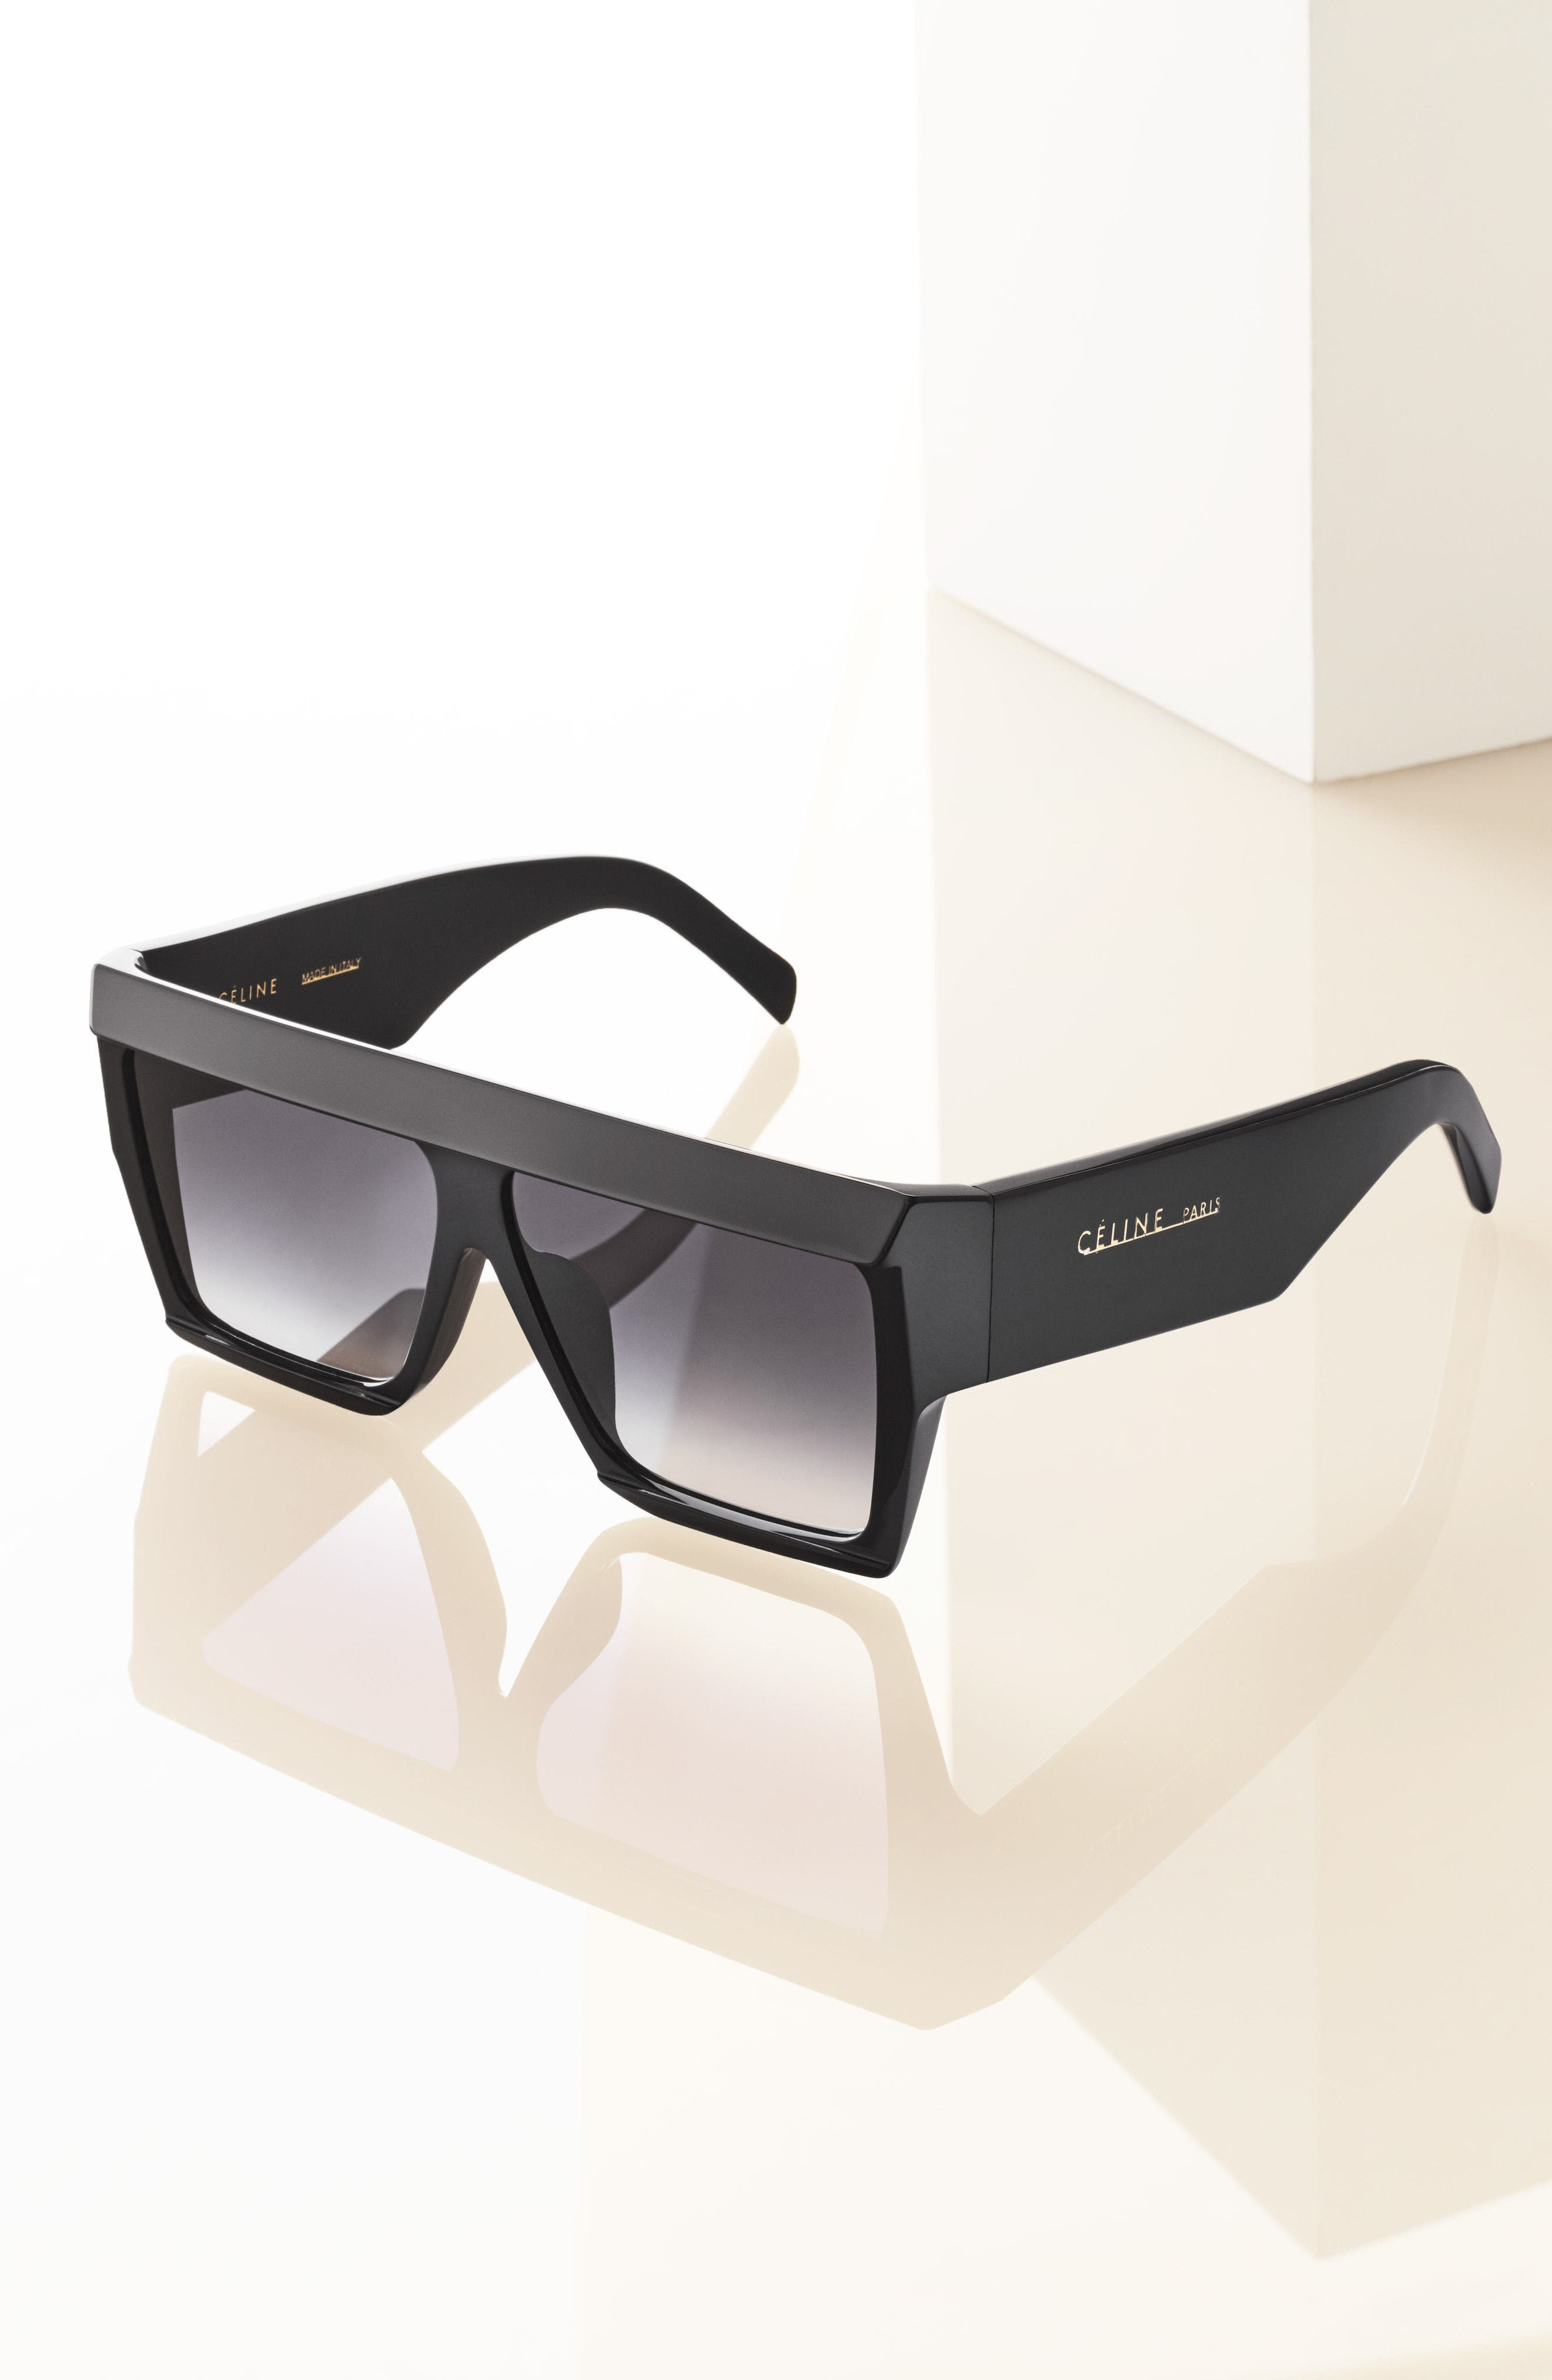 60mm Gradient Aviator Sunglasses,                             Alternate thumbnail 2, color,                             264